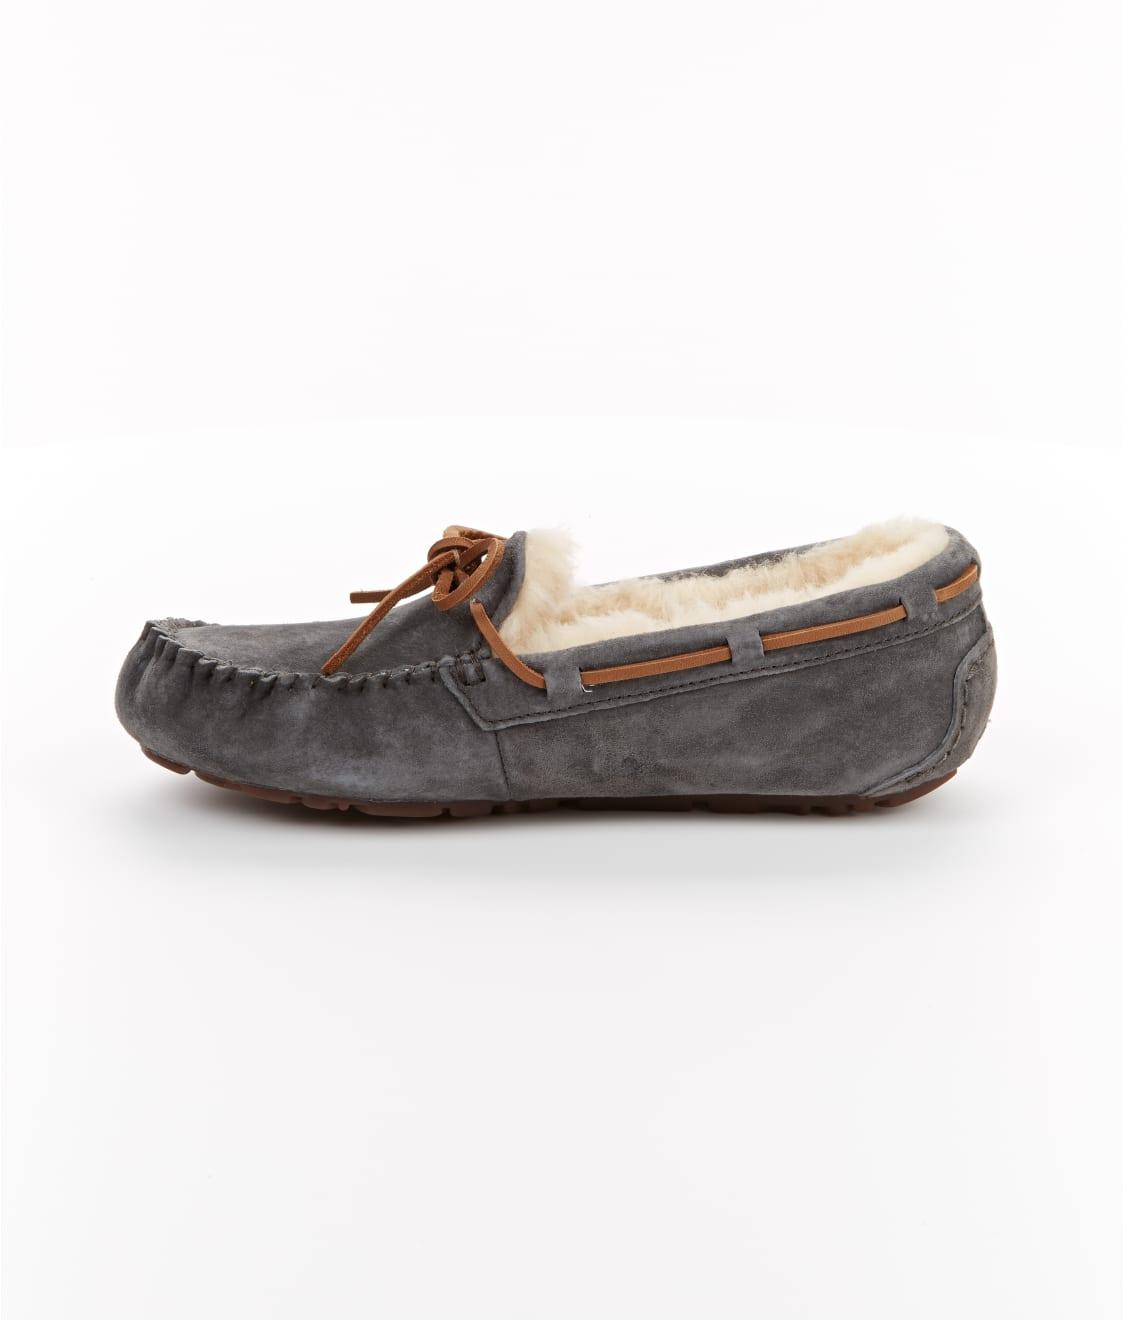 806c7fd3cd2 See Dakota Slippers in Pewter